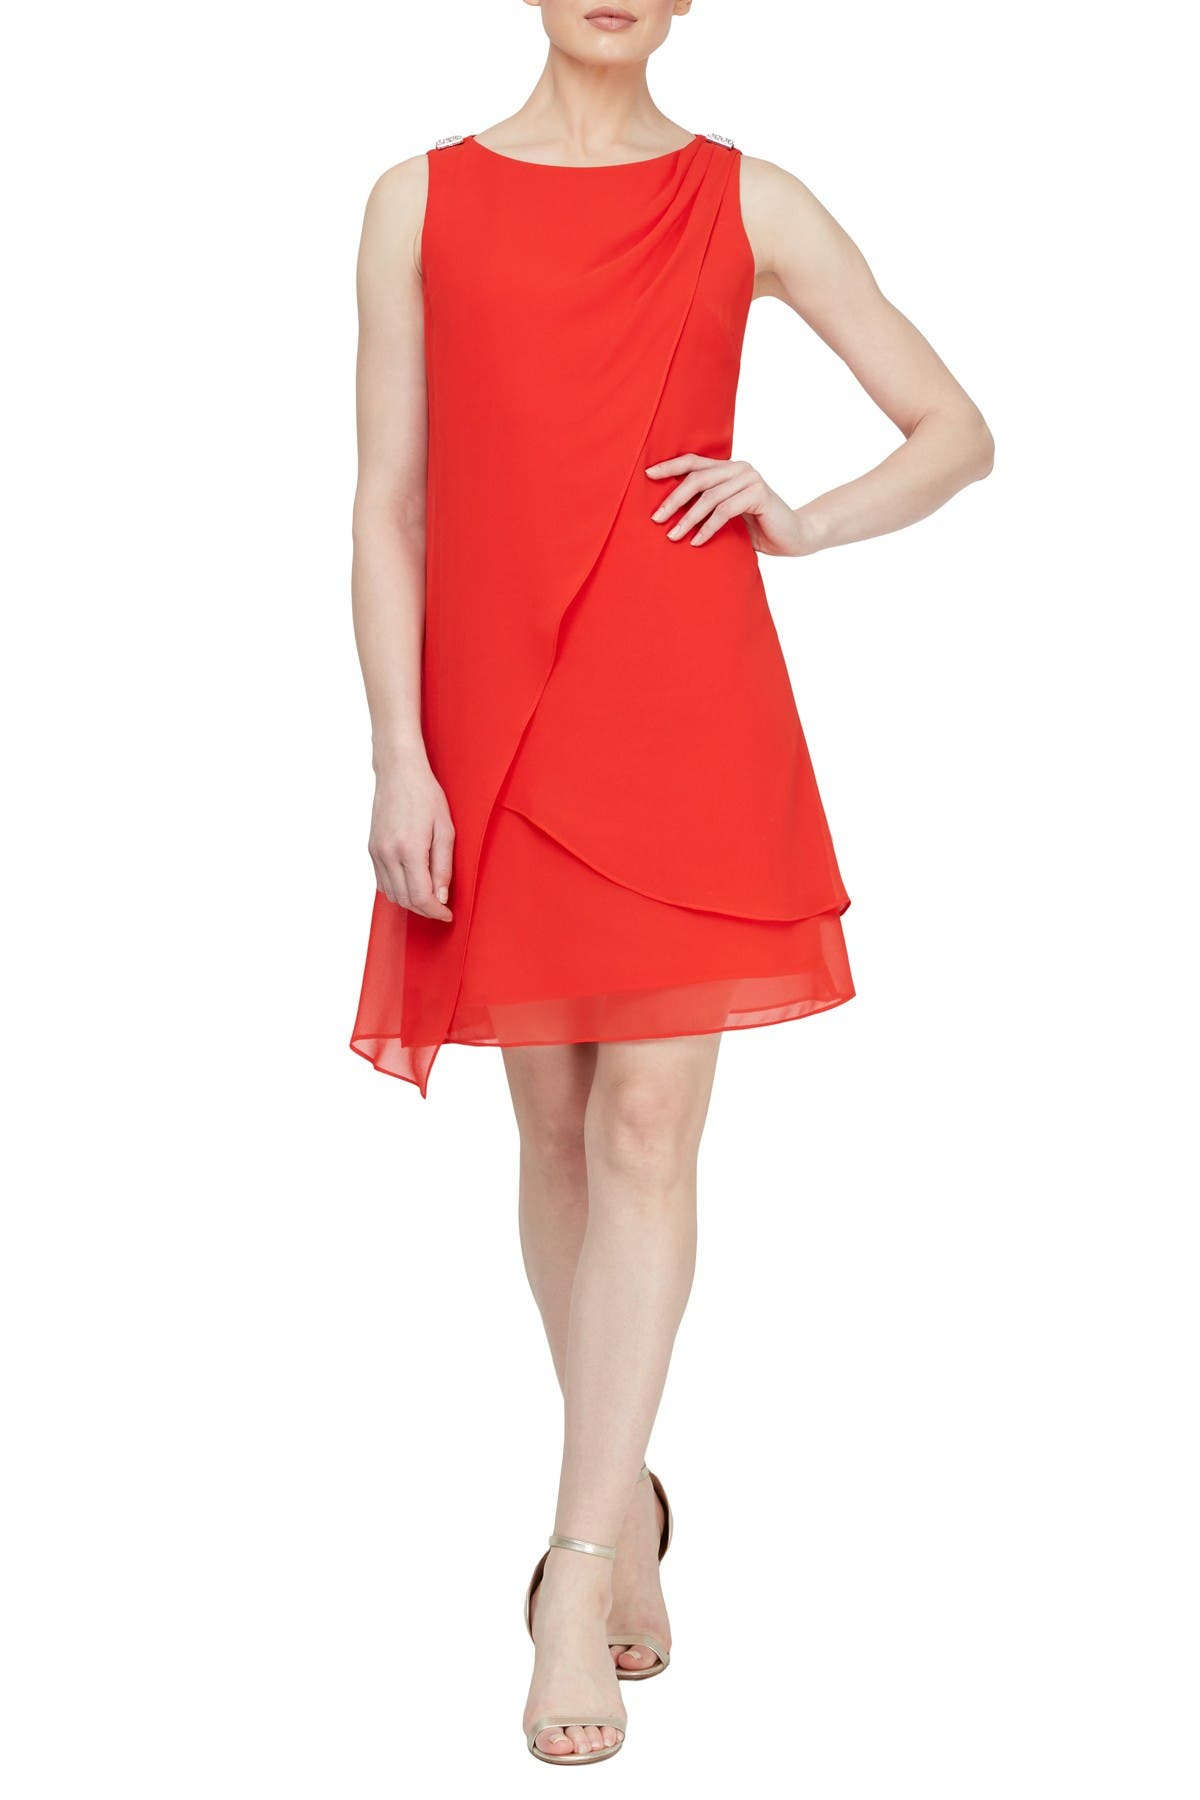 SLNY NEW Women/'s Layered Sheer One-shoulder Overlay Shift Dress TEDO